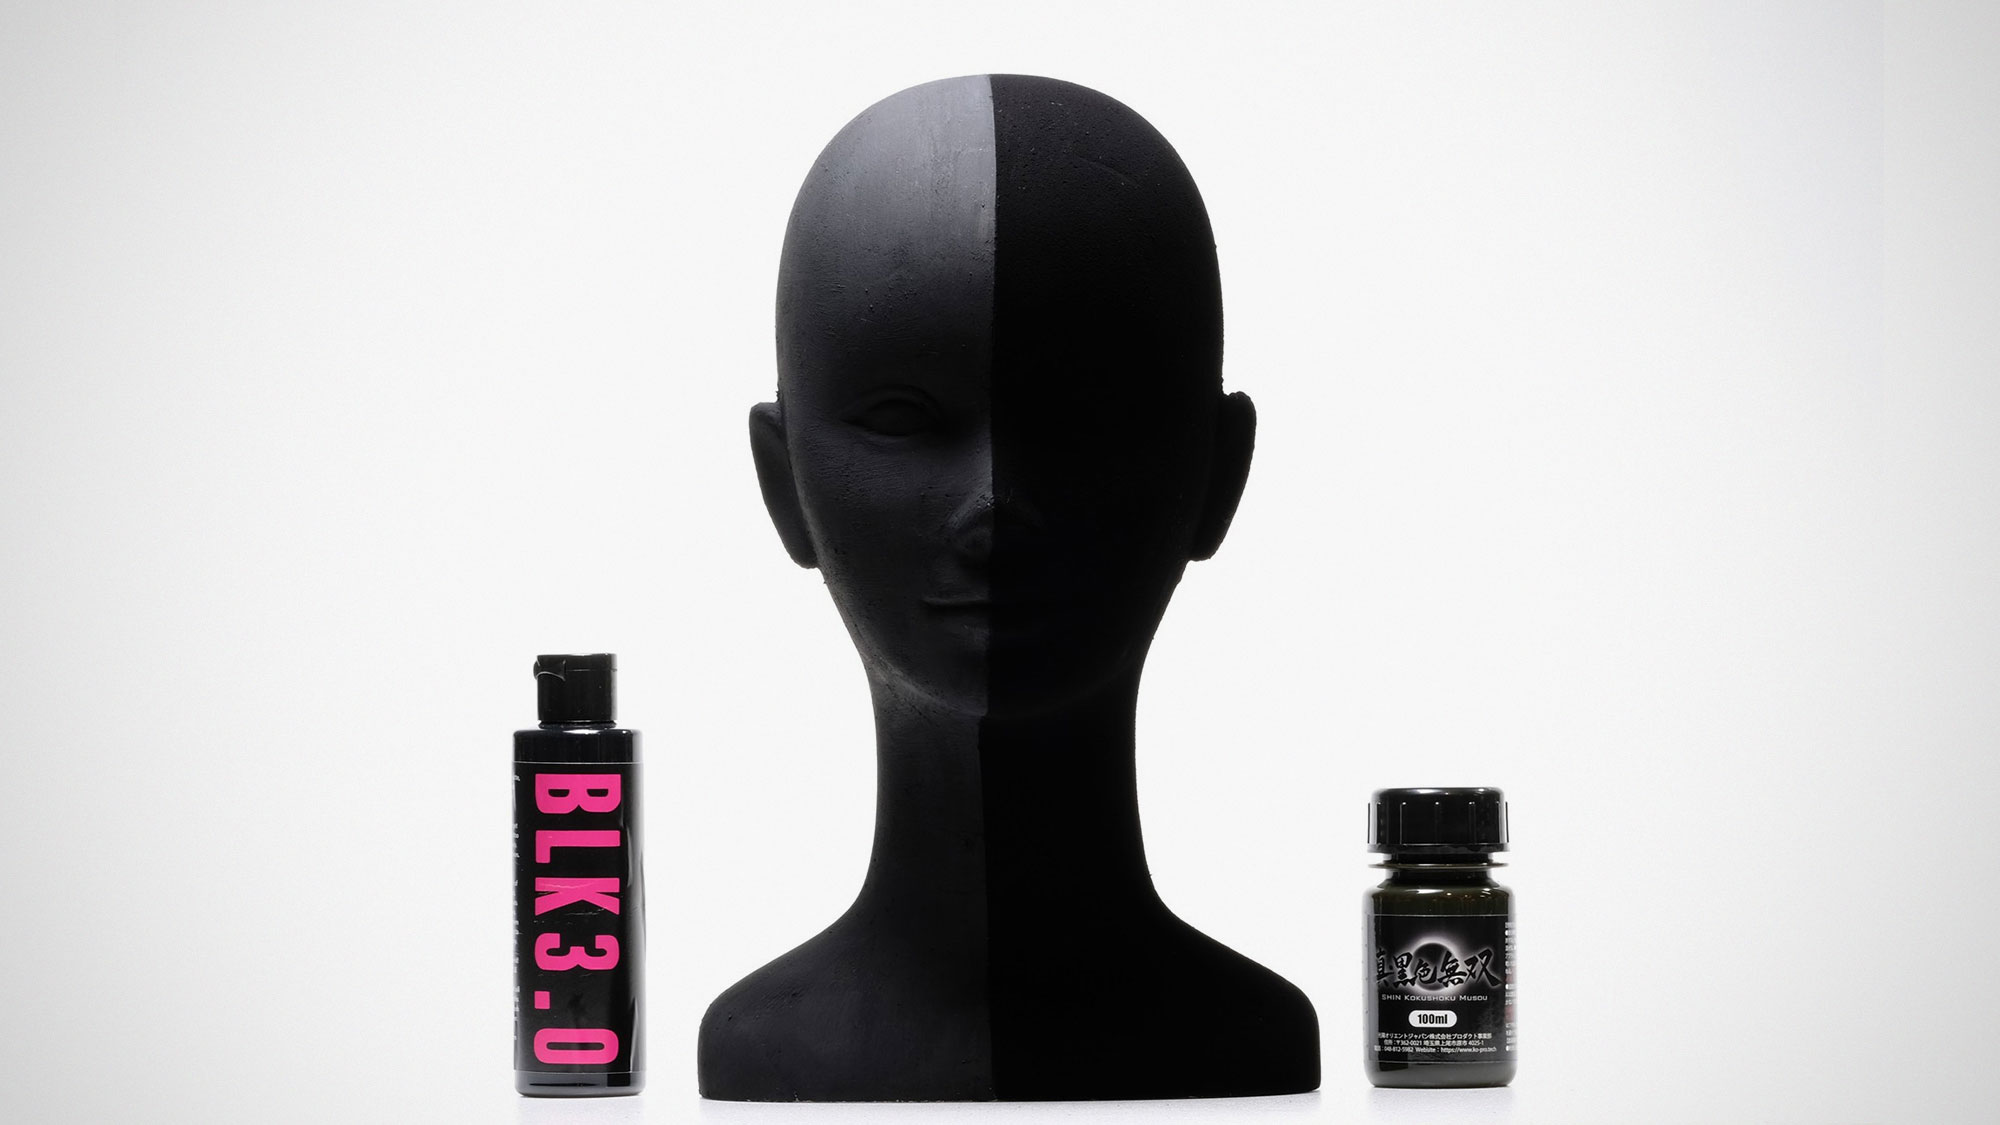 Musou Black Darkest Water-based Acrylic Paint